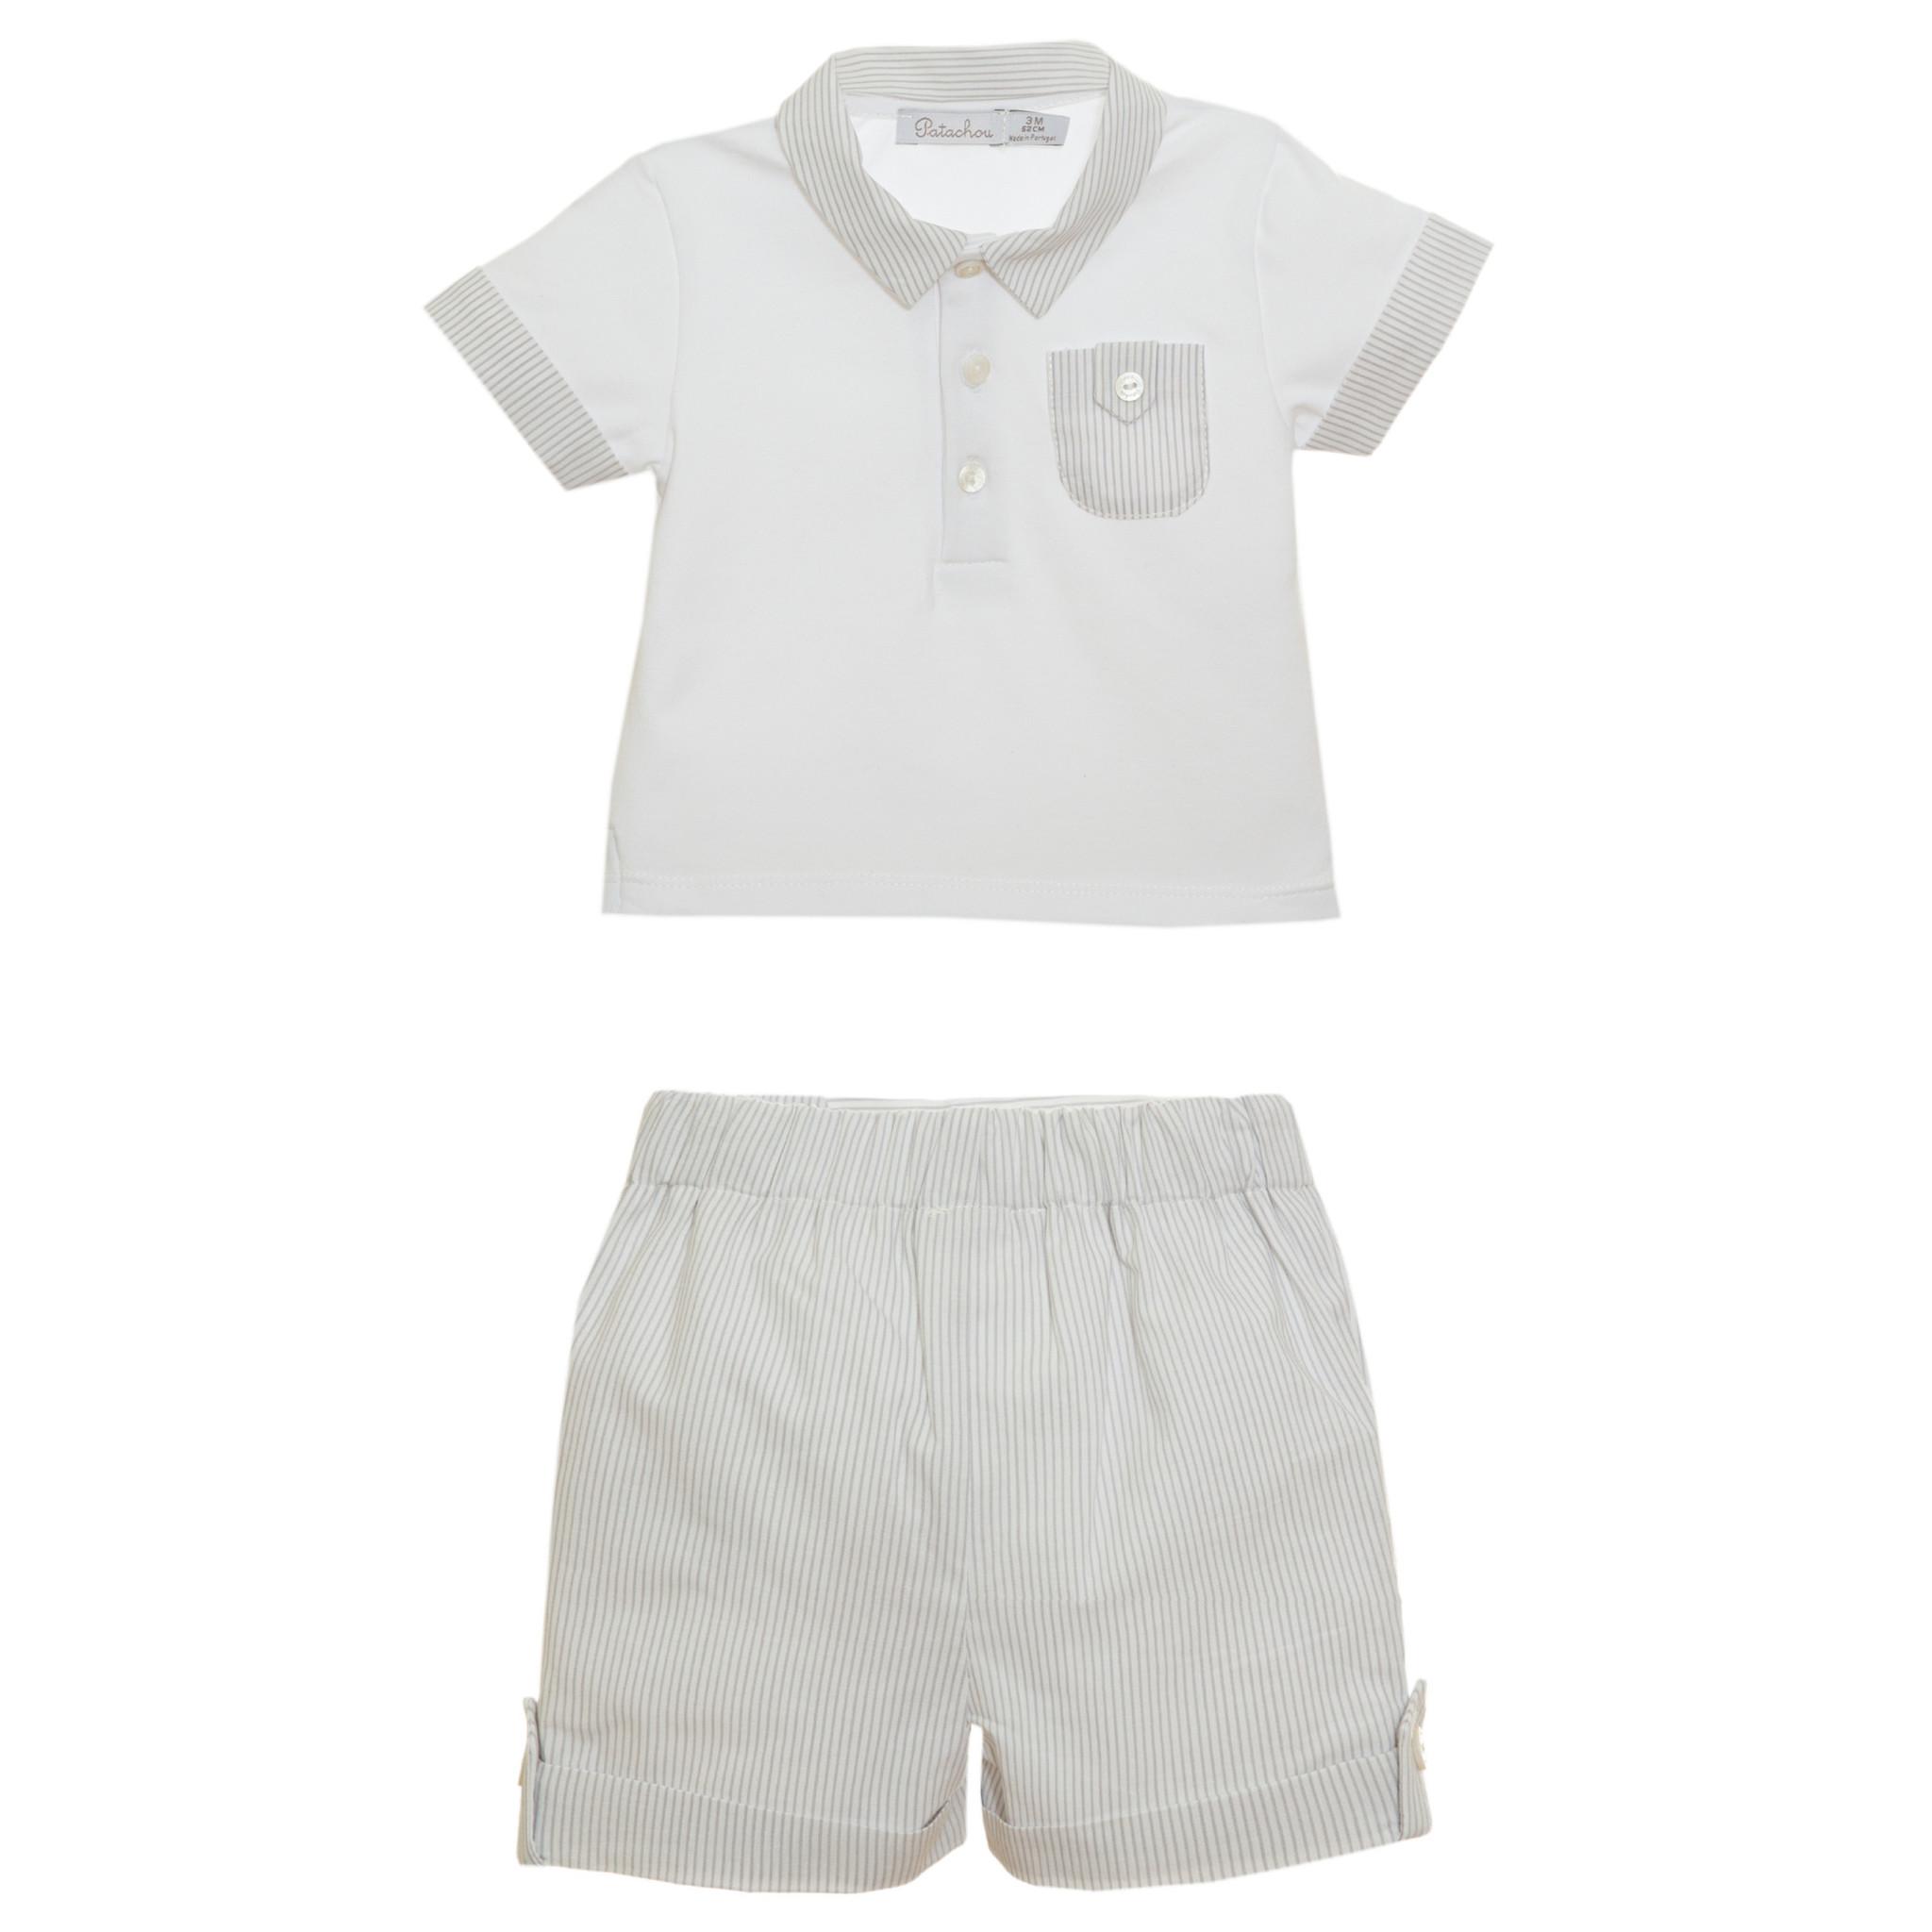 Patachou Boys Grey Stripe Short Set 3103 S21